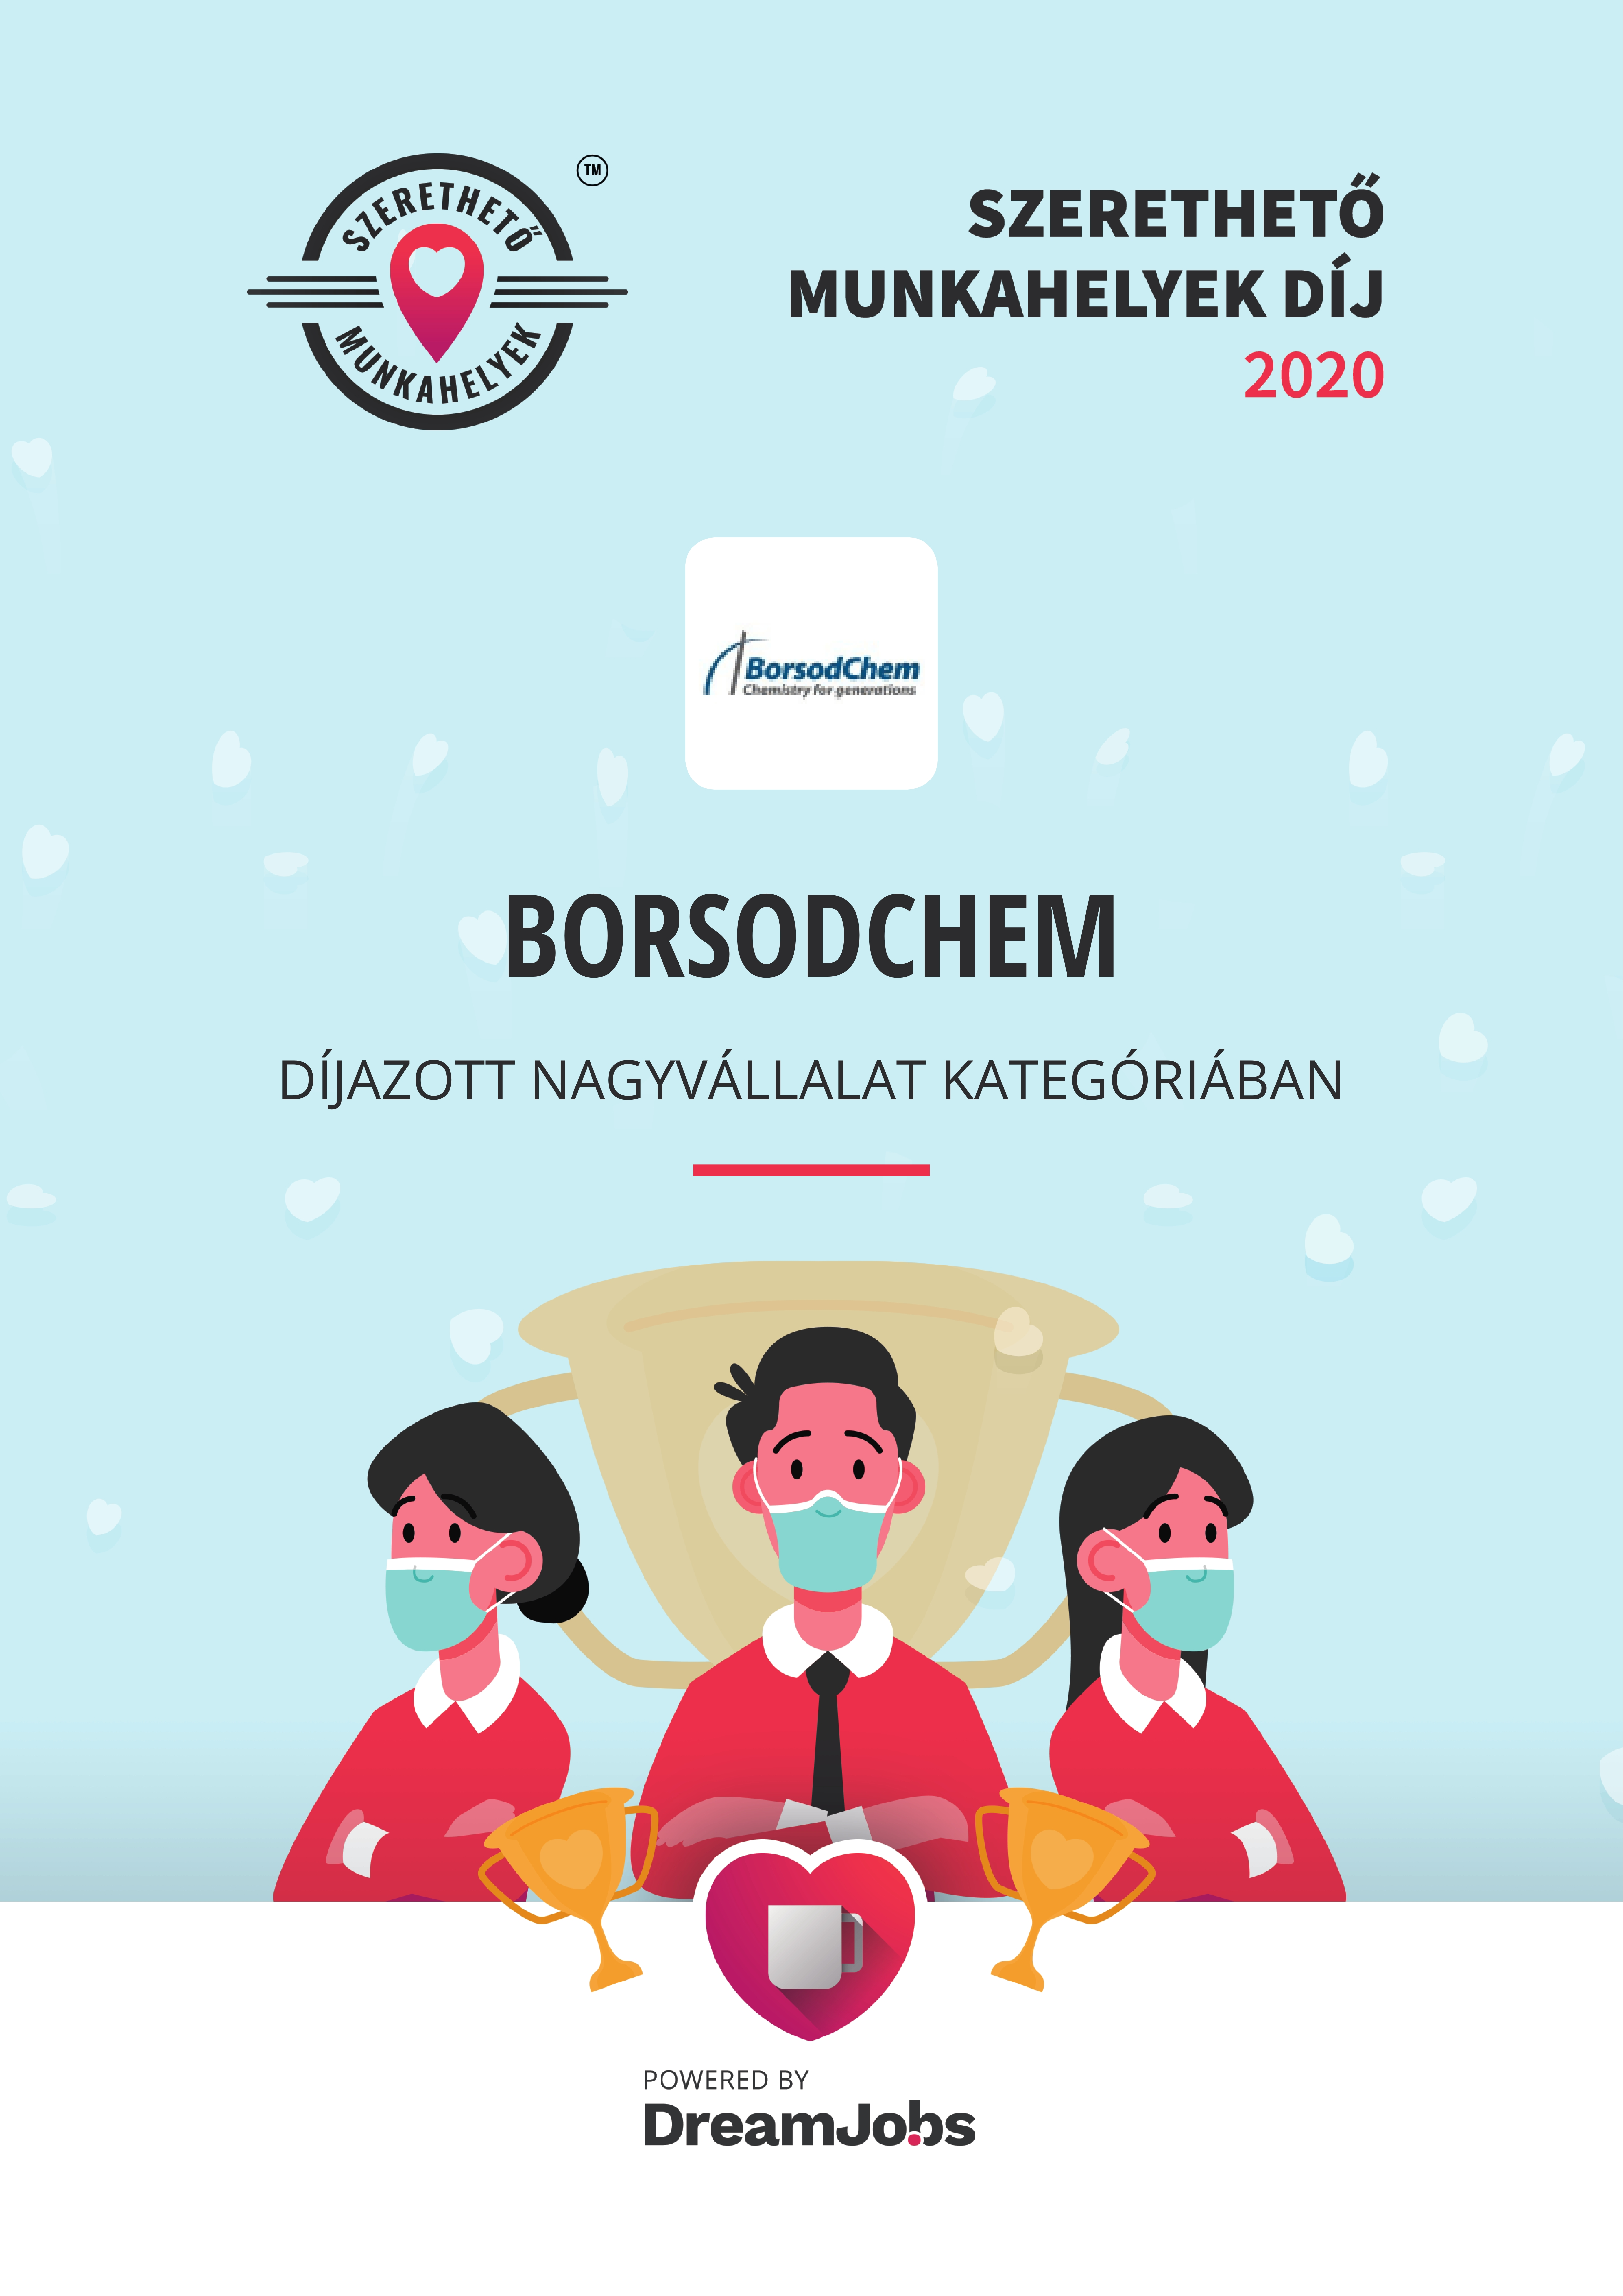 borsodchem-szmd-certi-MULTI